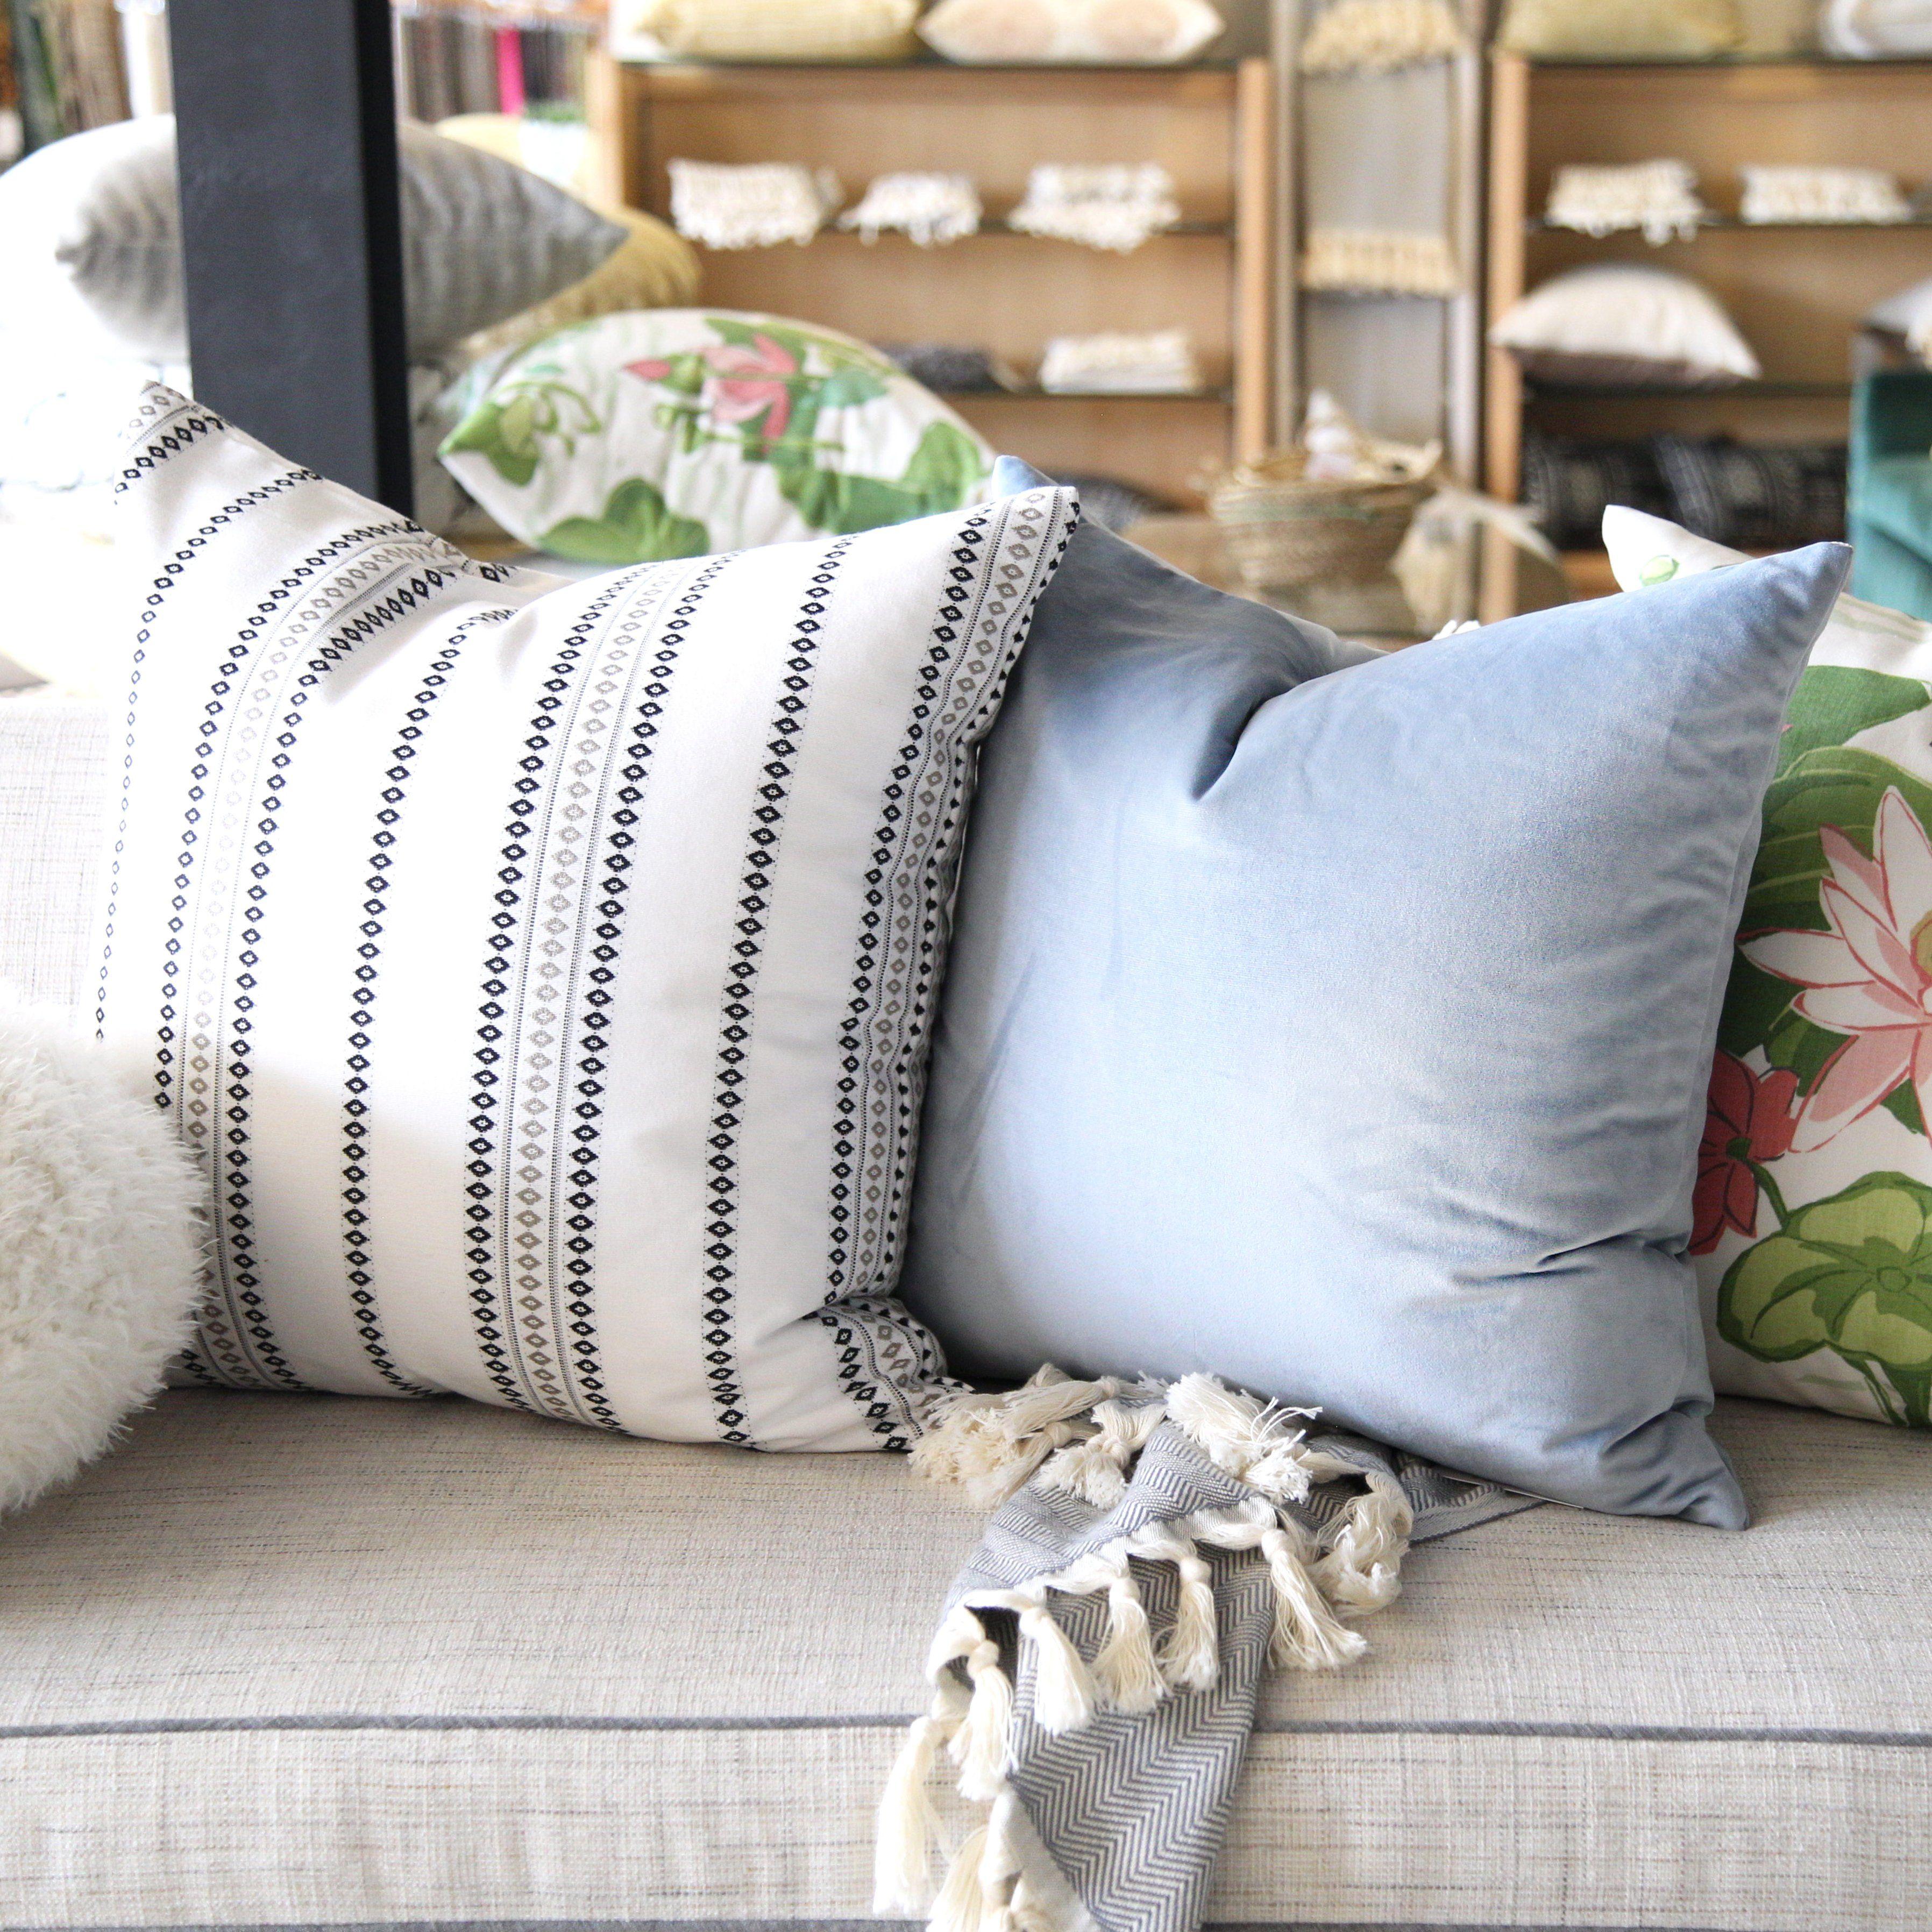 100 Polyester Sofa Throws Repair Sagging Cushions Ritz Velvet Sky Pillows By Tonic Living Pinterest